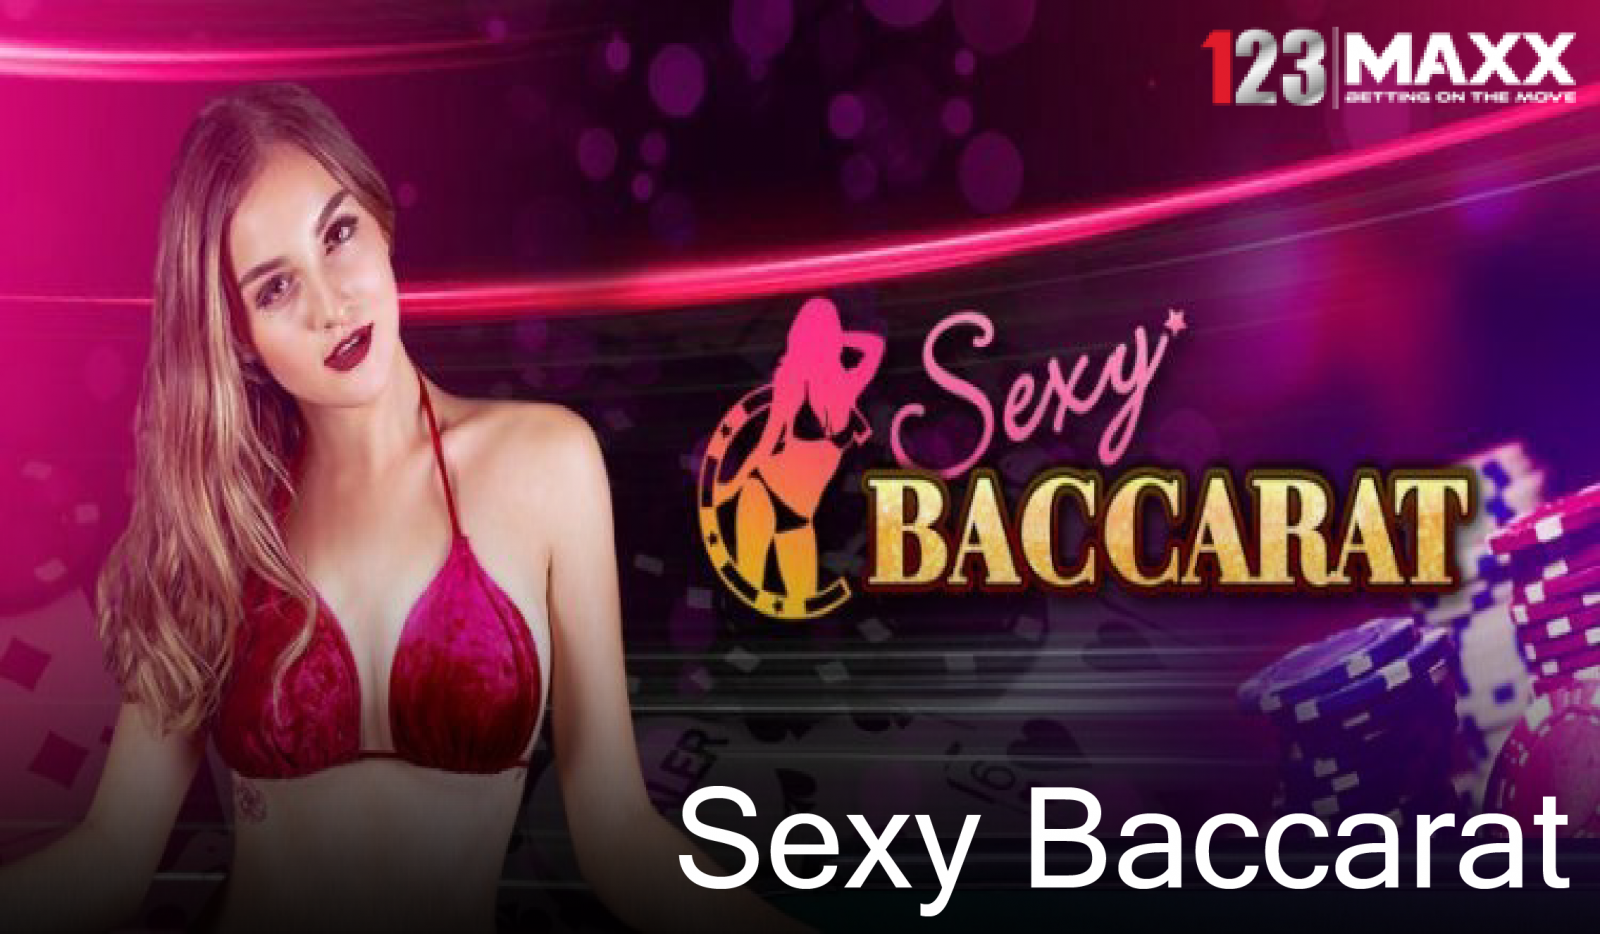 Sexy Baccarat 123maxx